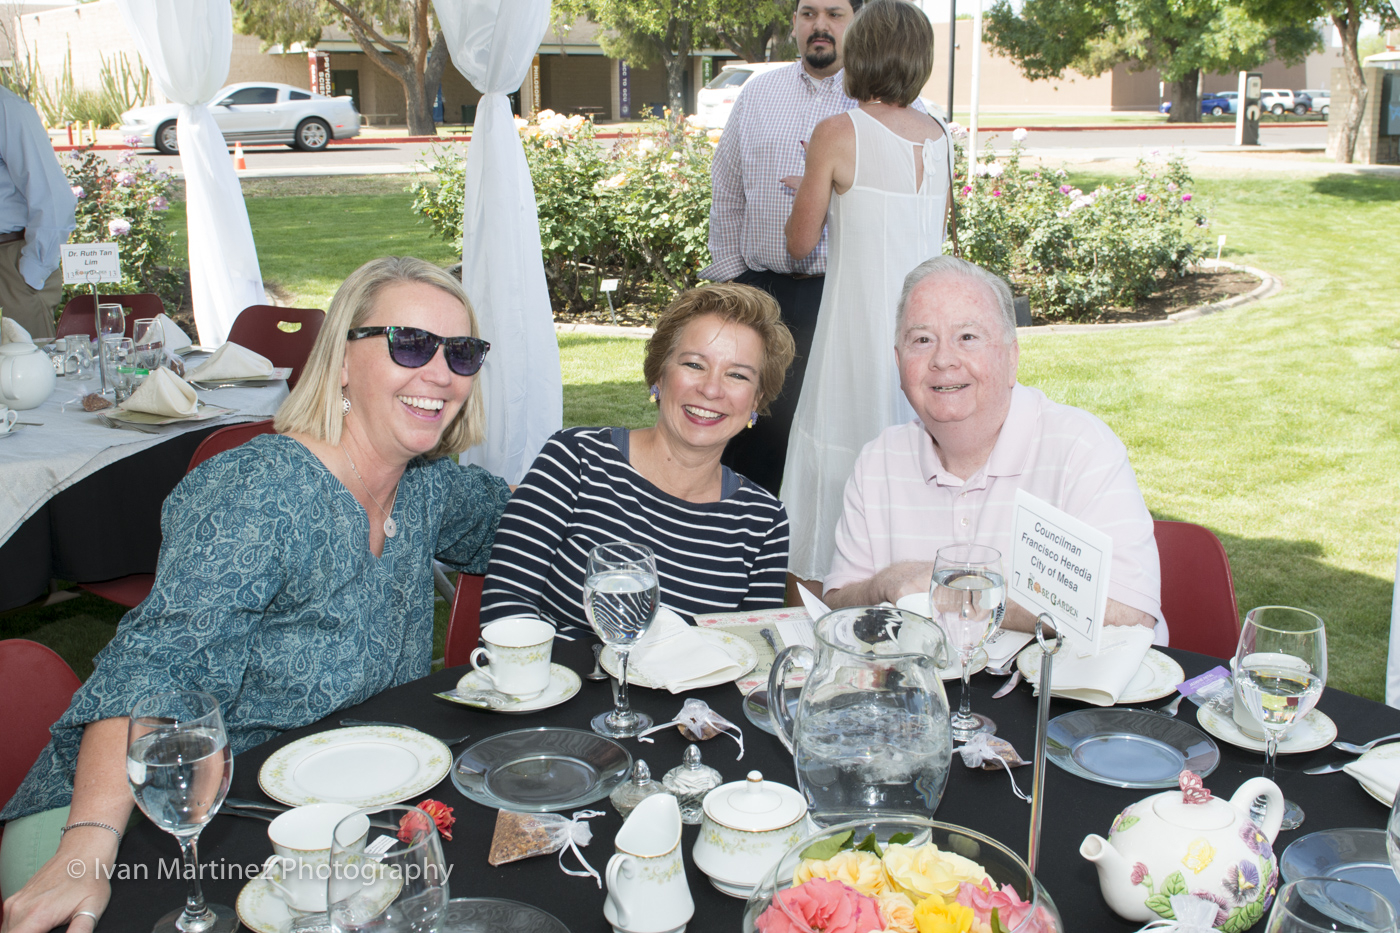 Councilmember Dennis Kavannaugh with participants at the Mesa Community College Rose Garden Tea Event